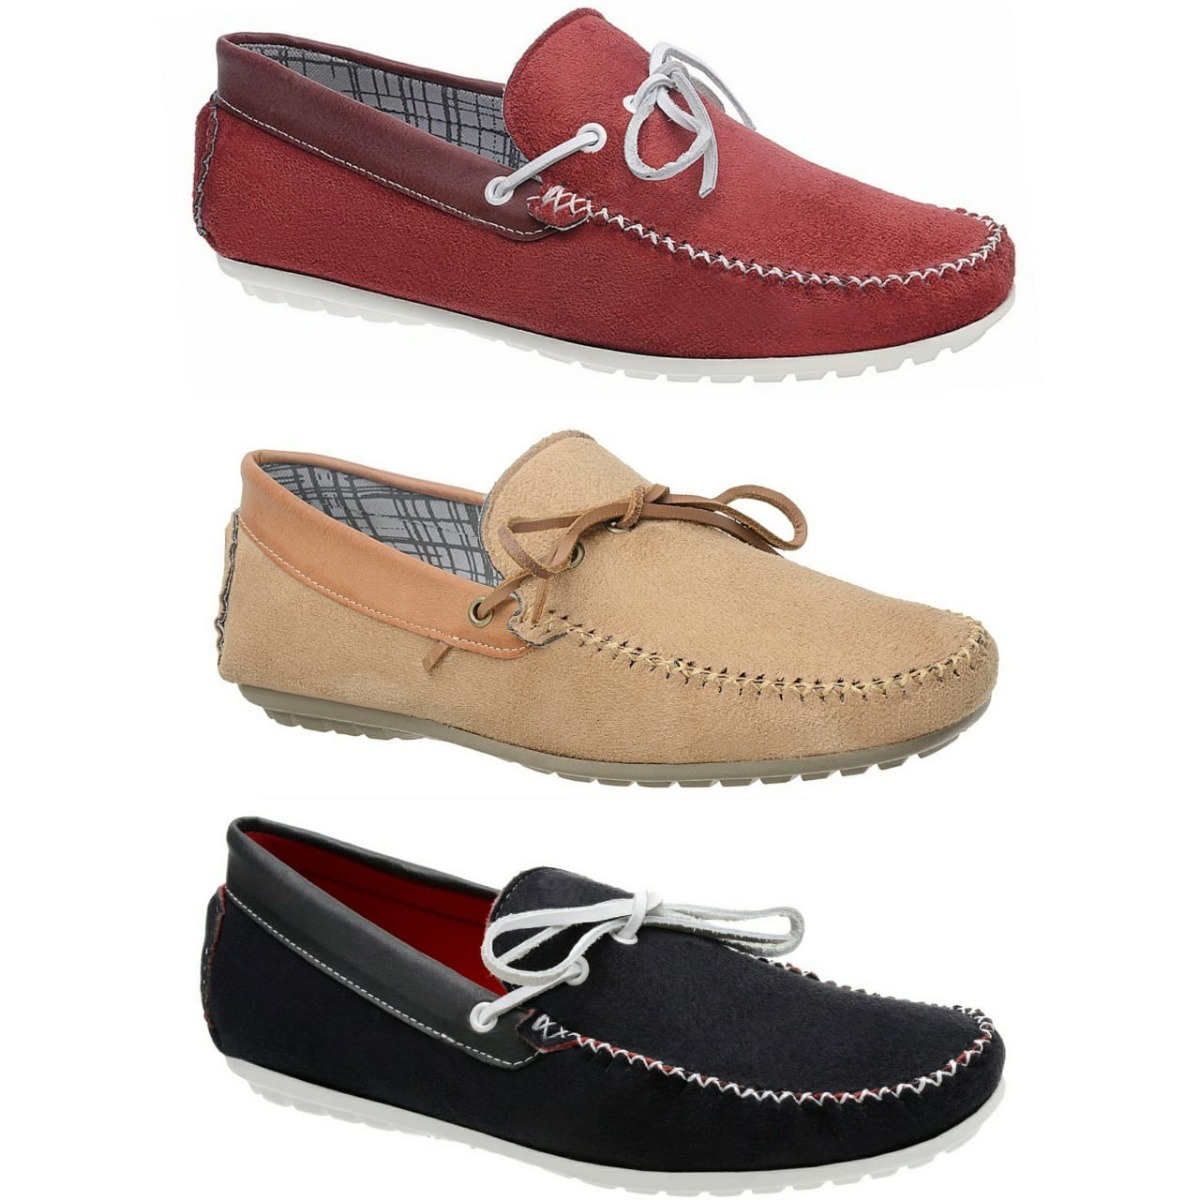 2f77aeb470 kit 3 pares mocassim masculino dockside sapato casual. Carregando zoom.